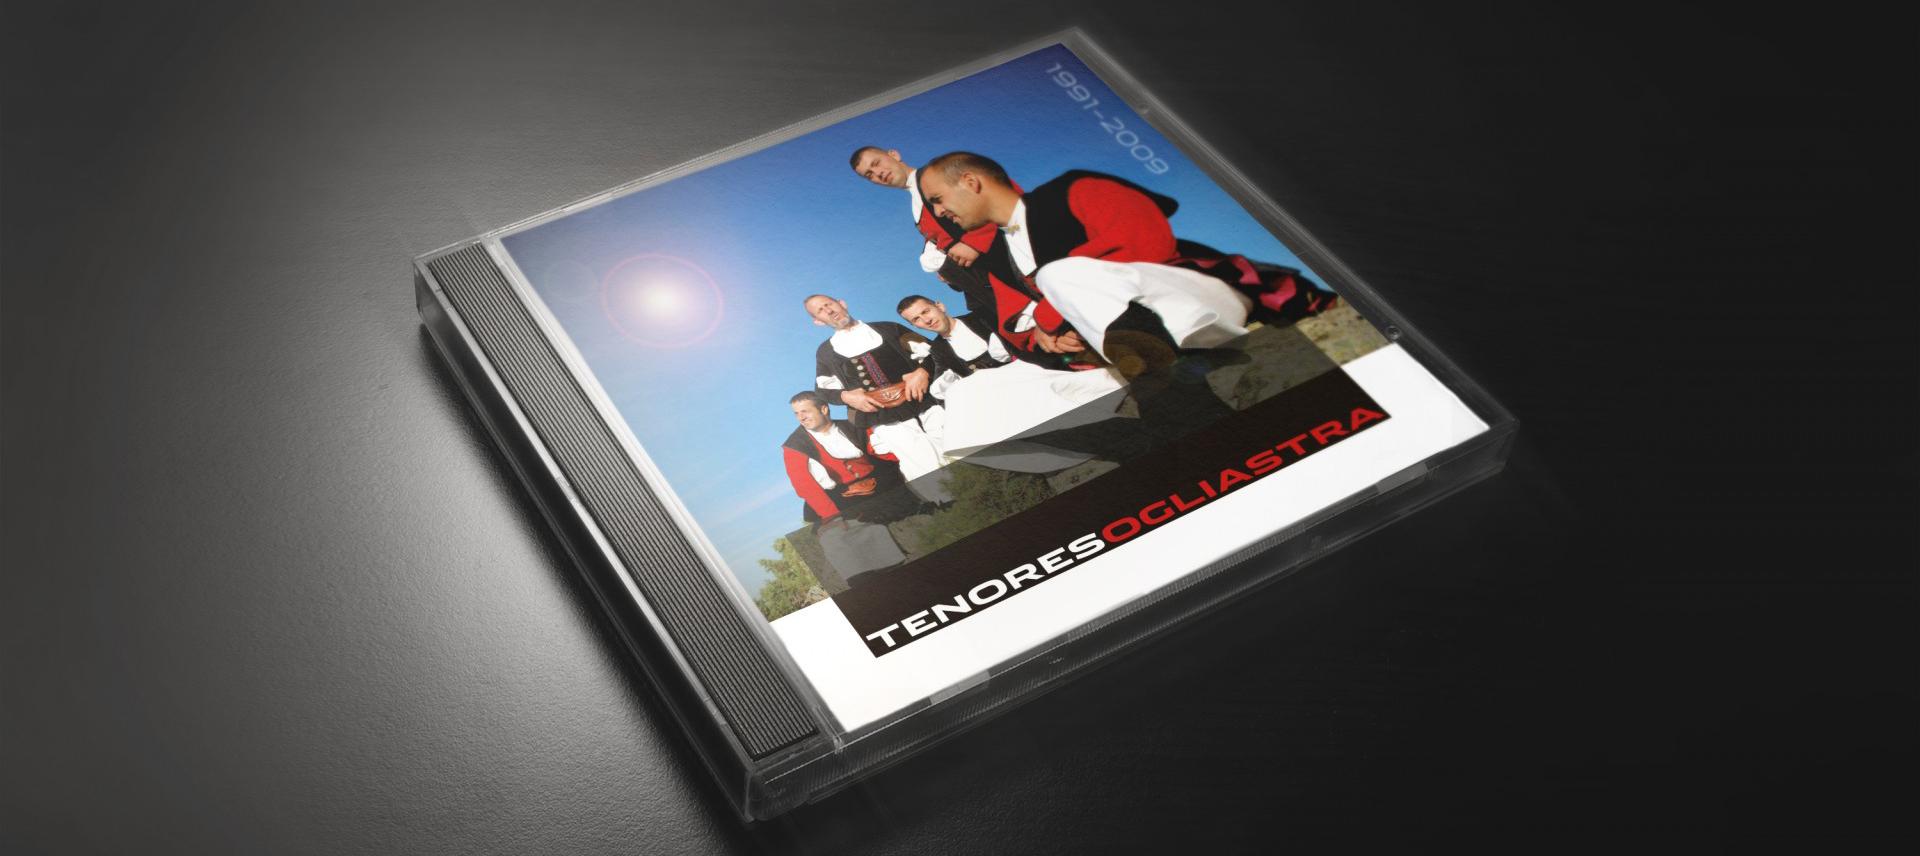 tenores ogliastra CD 2009